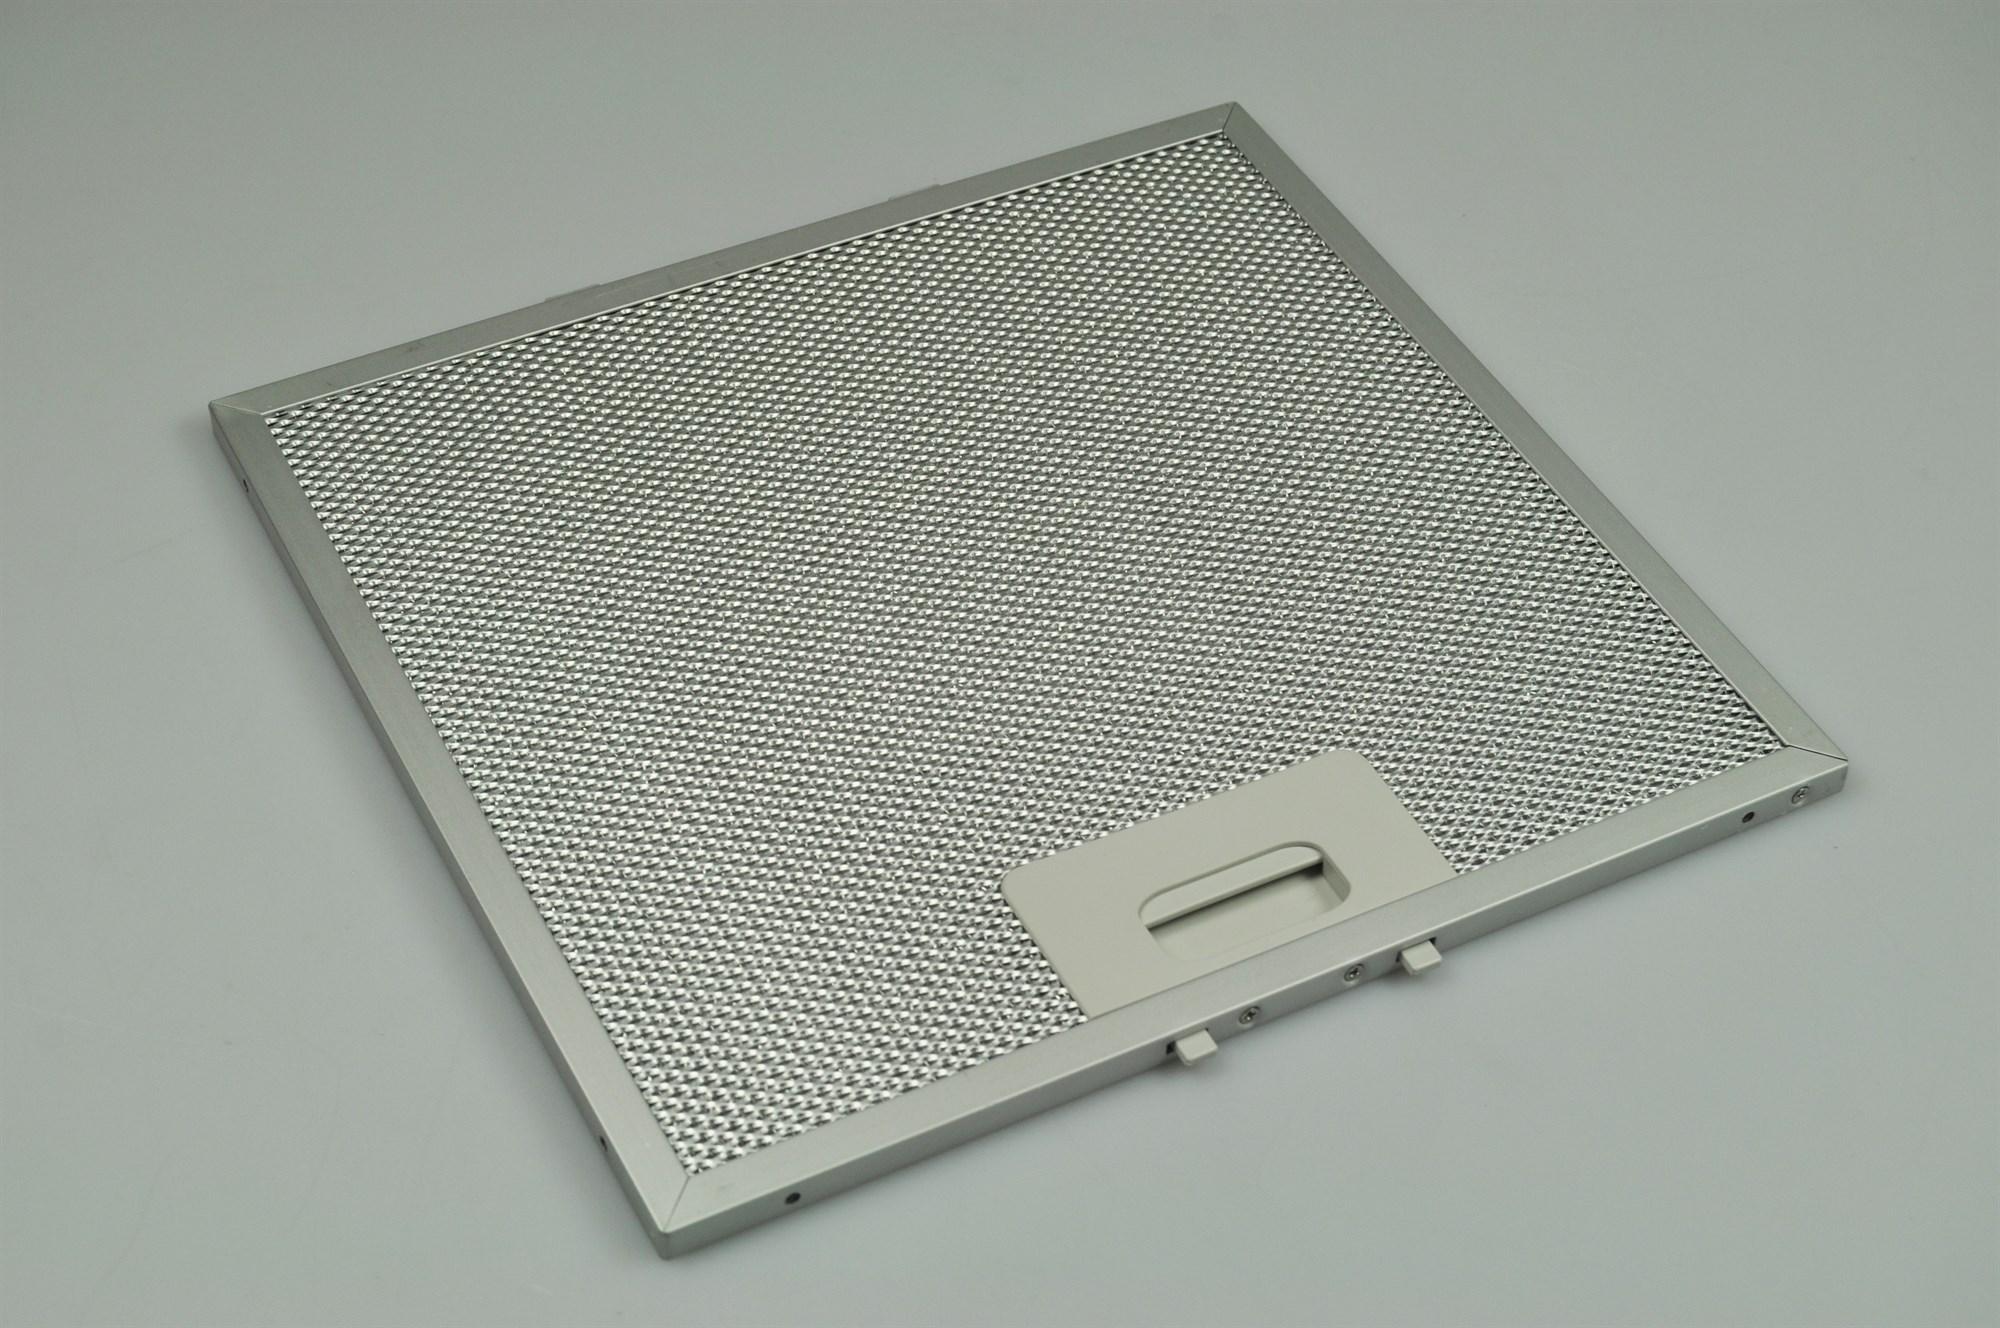 Metallfilter gorenje dunstabzugshaube mm mm mm